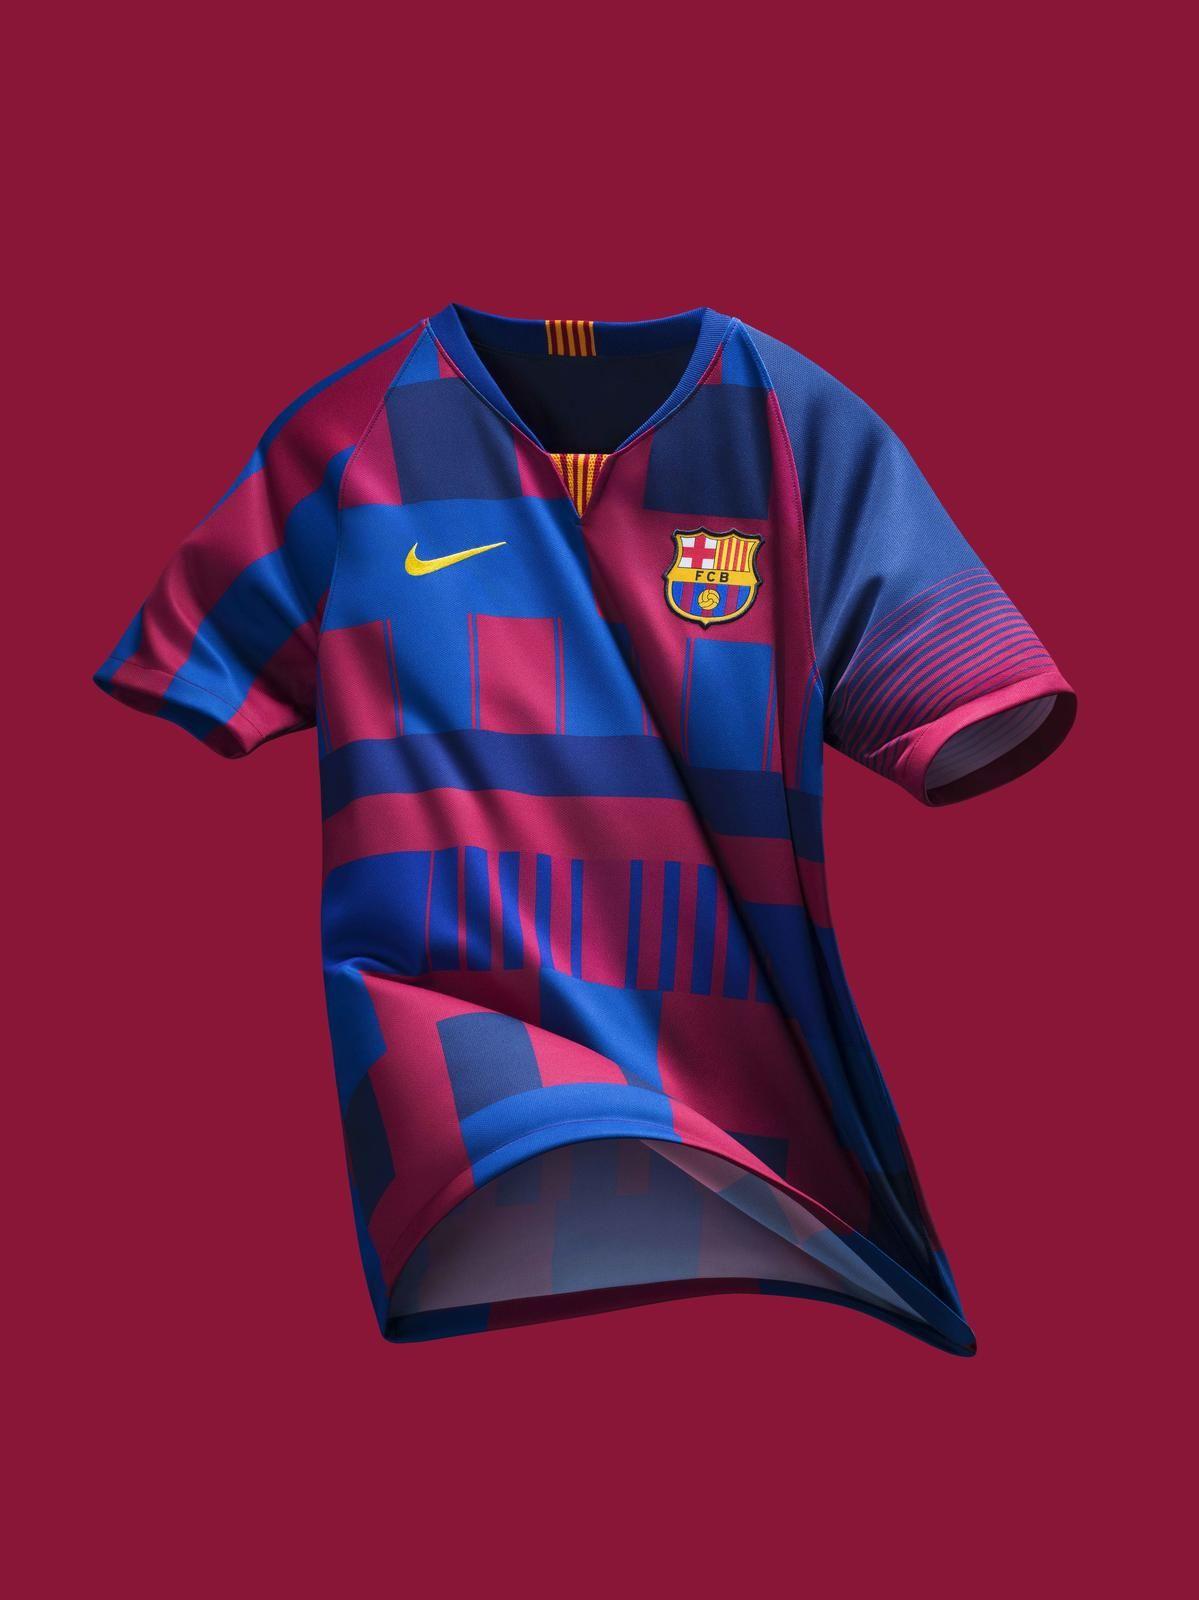 5f5bdec55e1675 FC Barcelona and Nike Mark 20th Anniversary in Style